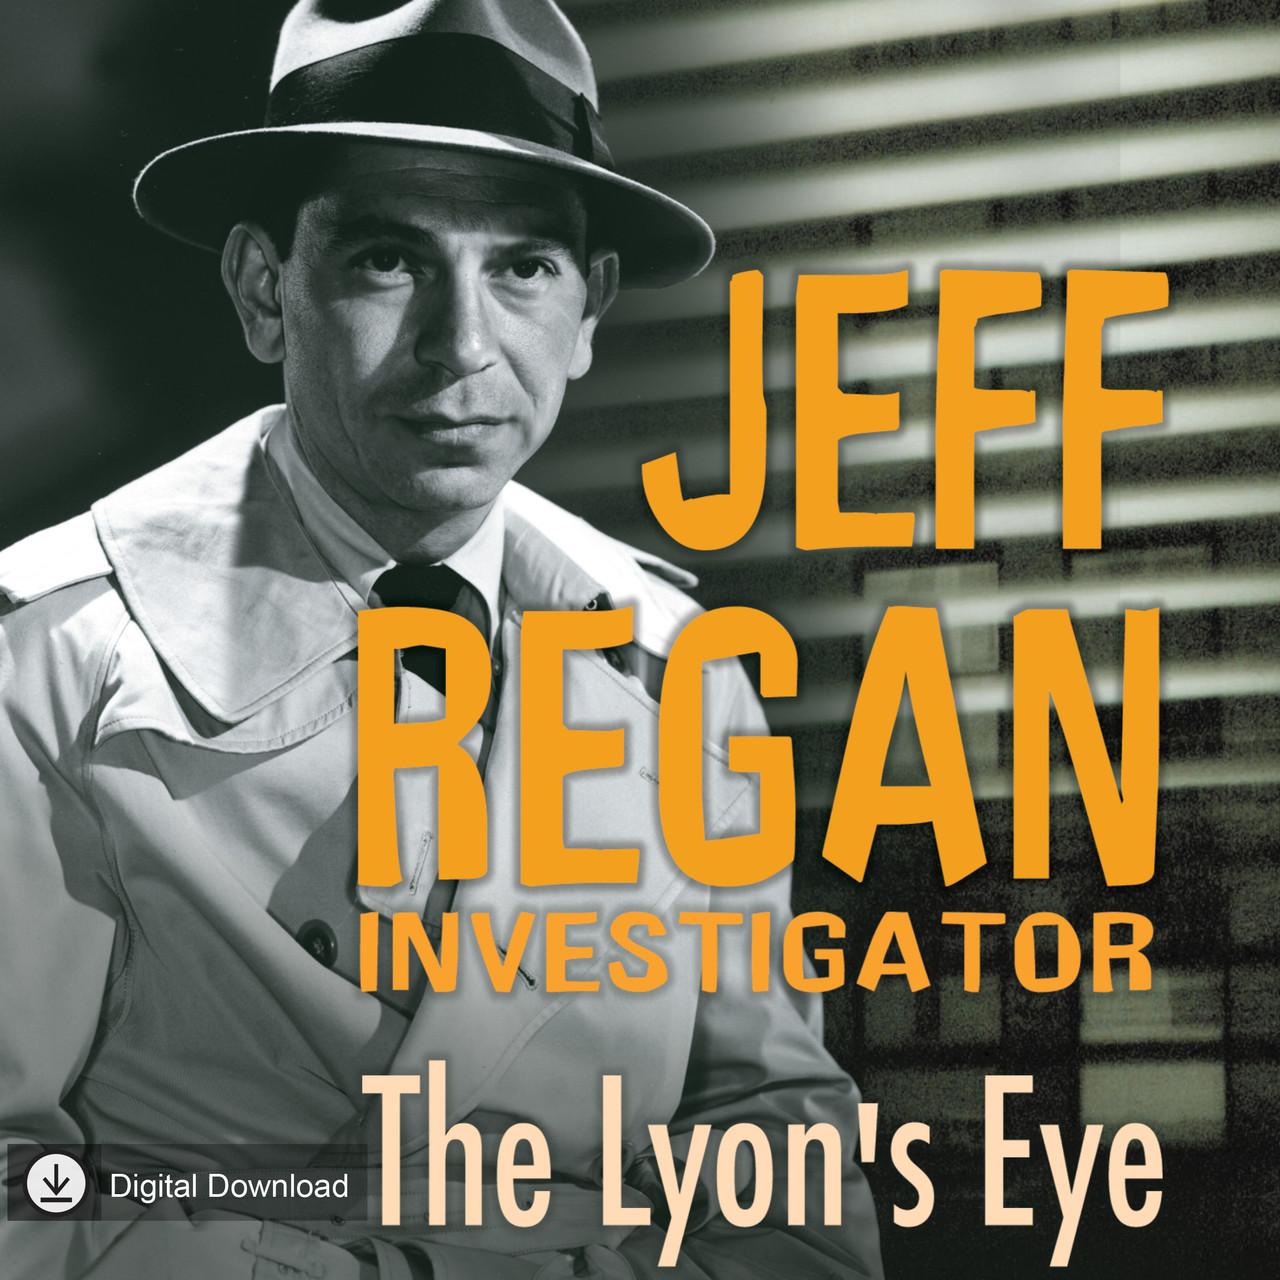 Jeff Regan Investigator: The Lyon's Eye (MP3 Download)